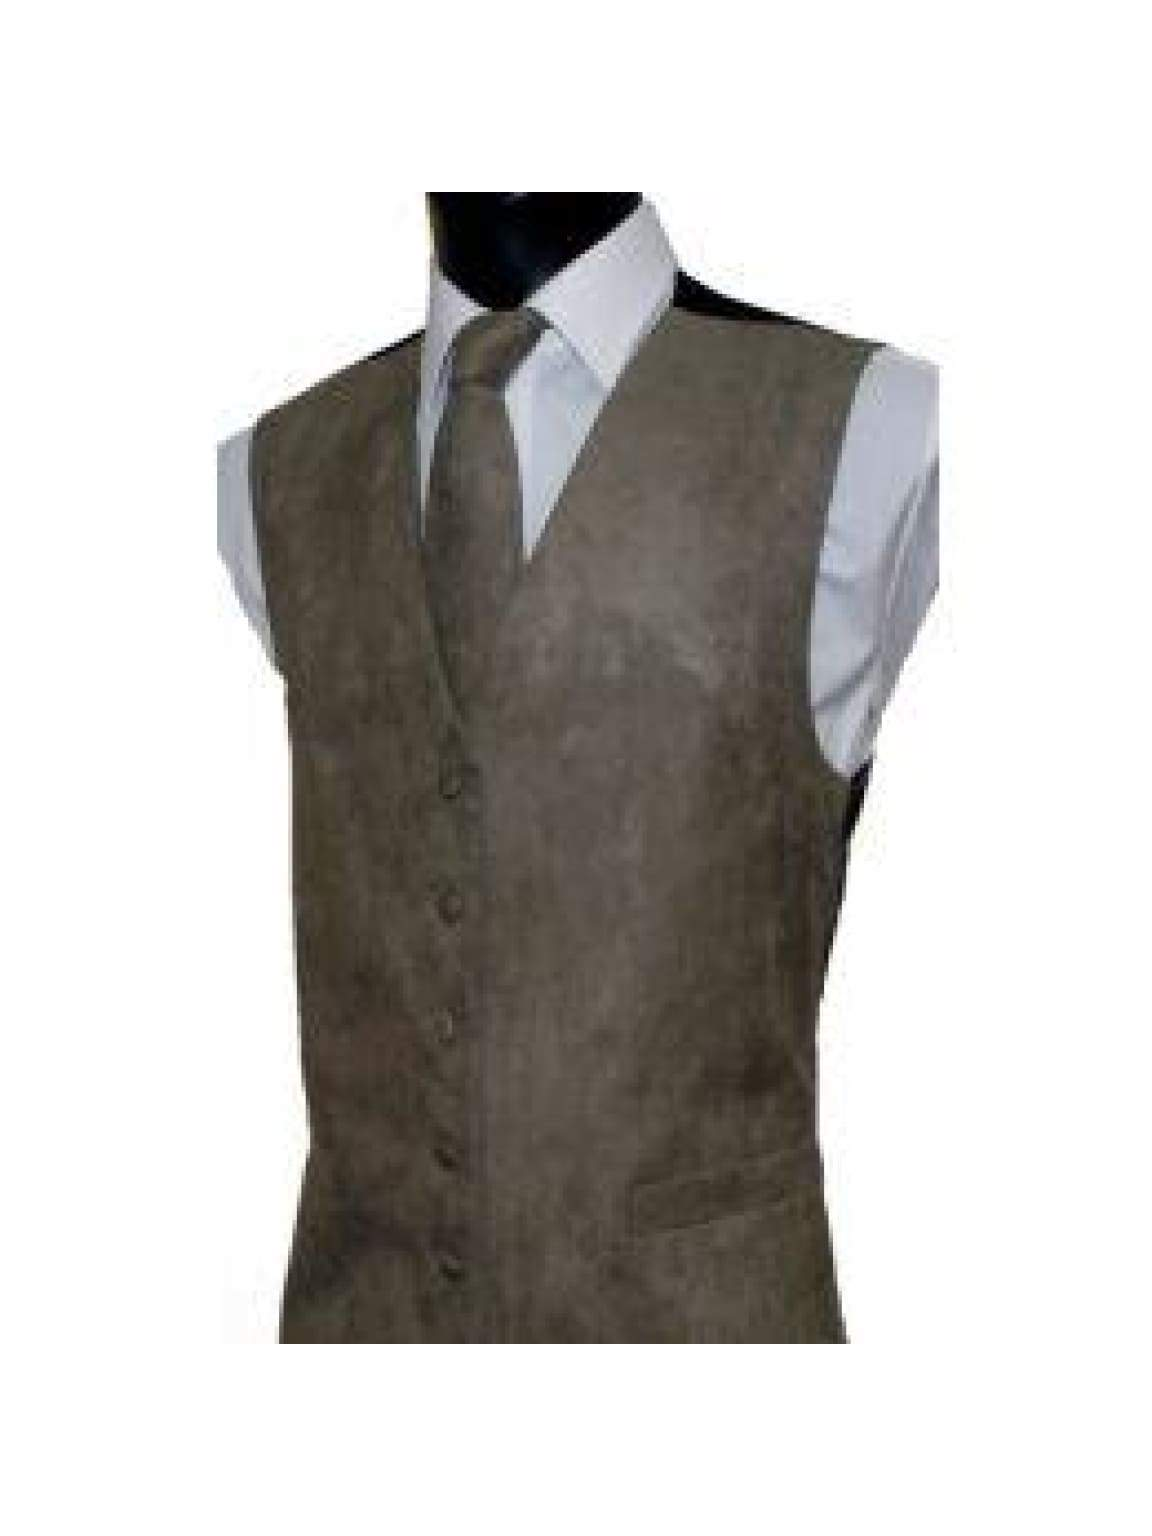 L A Smith Tuape Suede Look Waistcoat - S - Suit & Tailoring